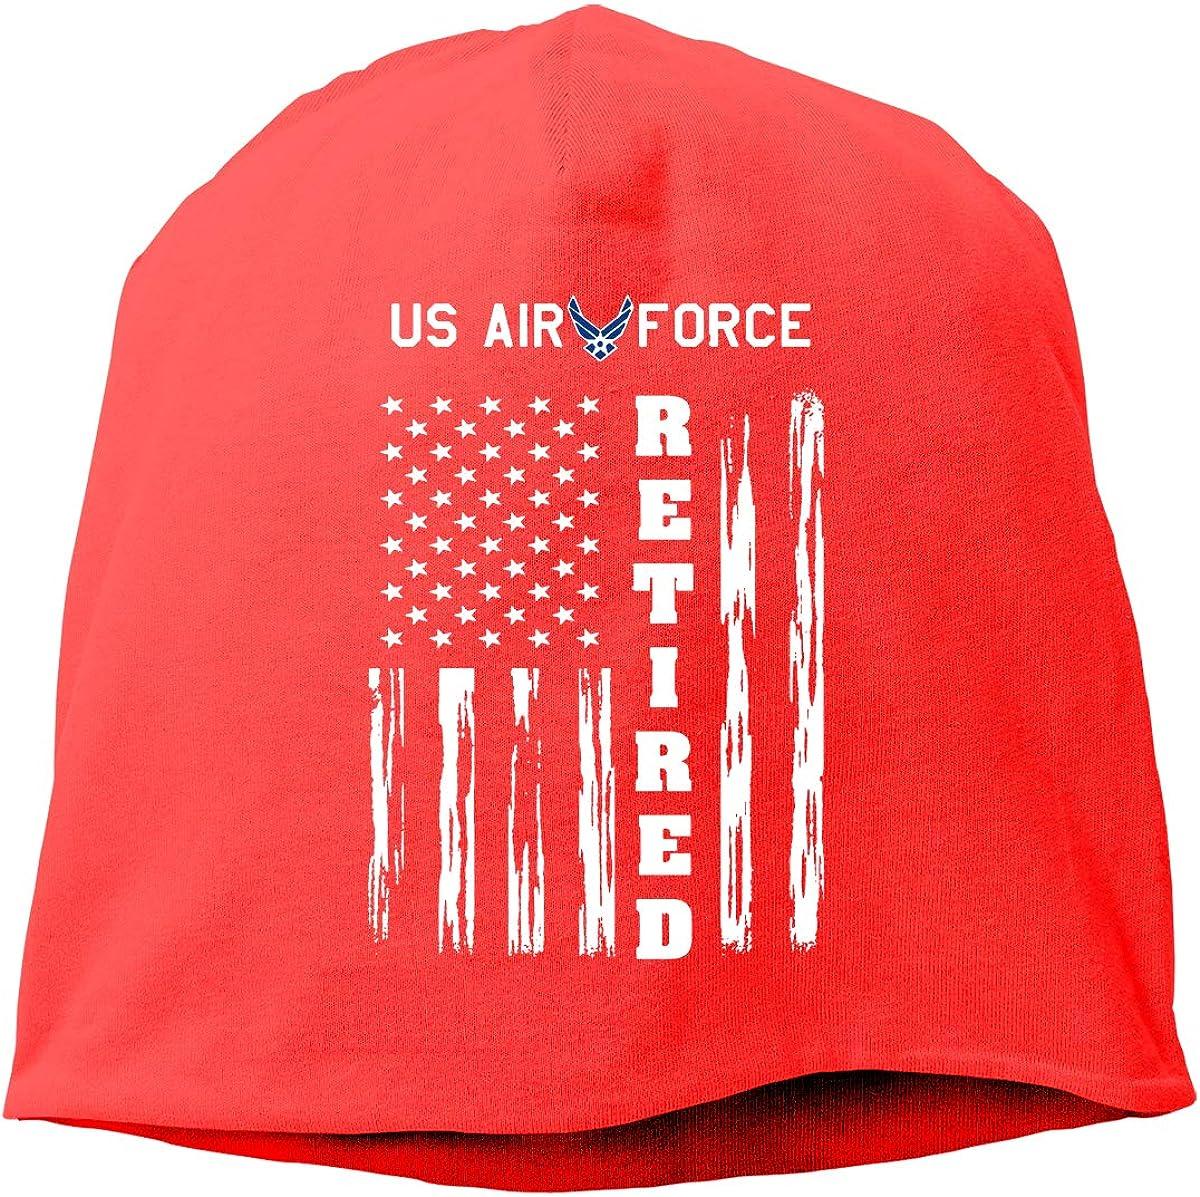 QKQ77 KK7 US AIR Force Retired American Flag Hedging Hat Unisex Skull Hat Knitted Hat Beanie Cap for Autumn//Winter Cap